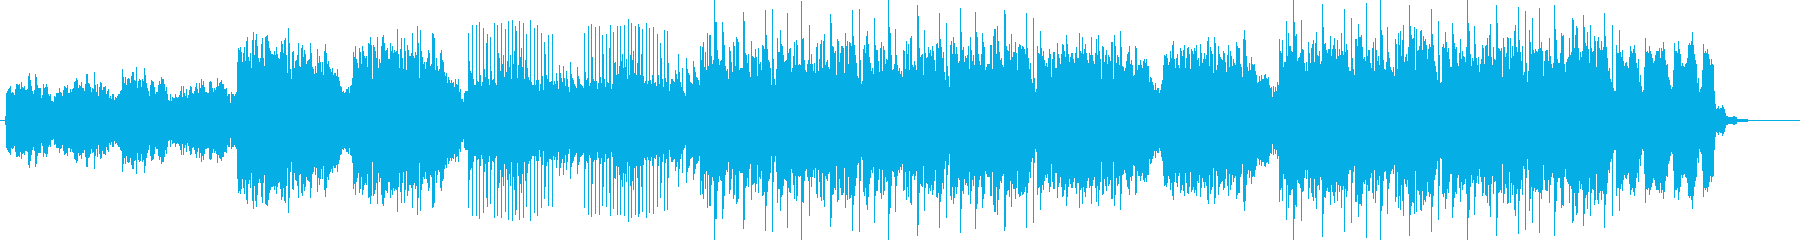 ♰DARK、HORROR、不気味な作曲♰の再生済みの波形